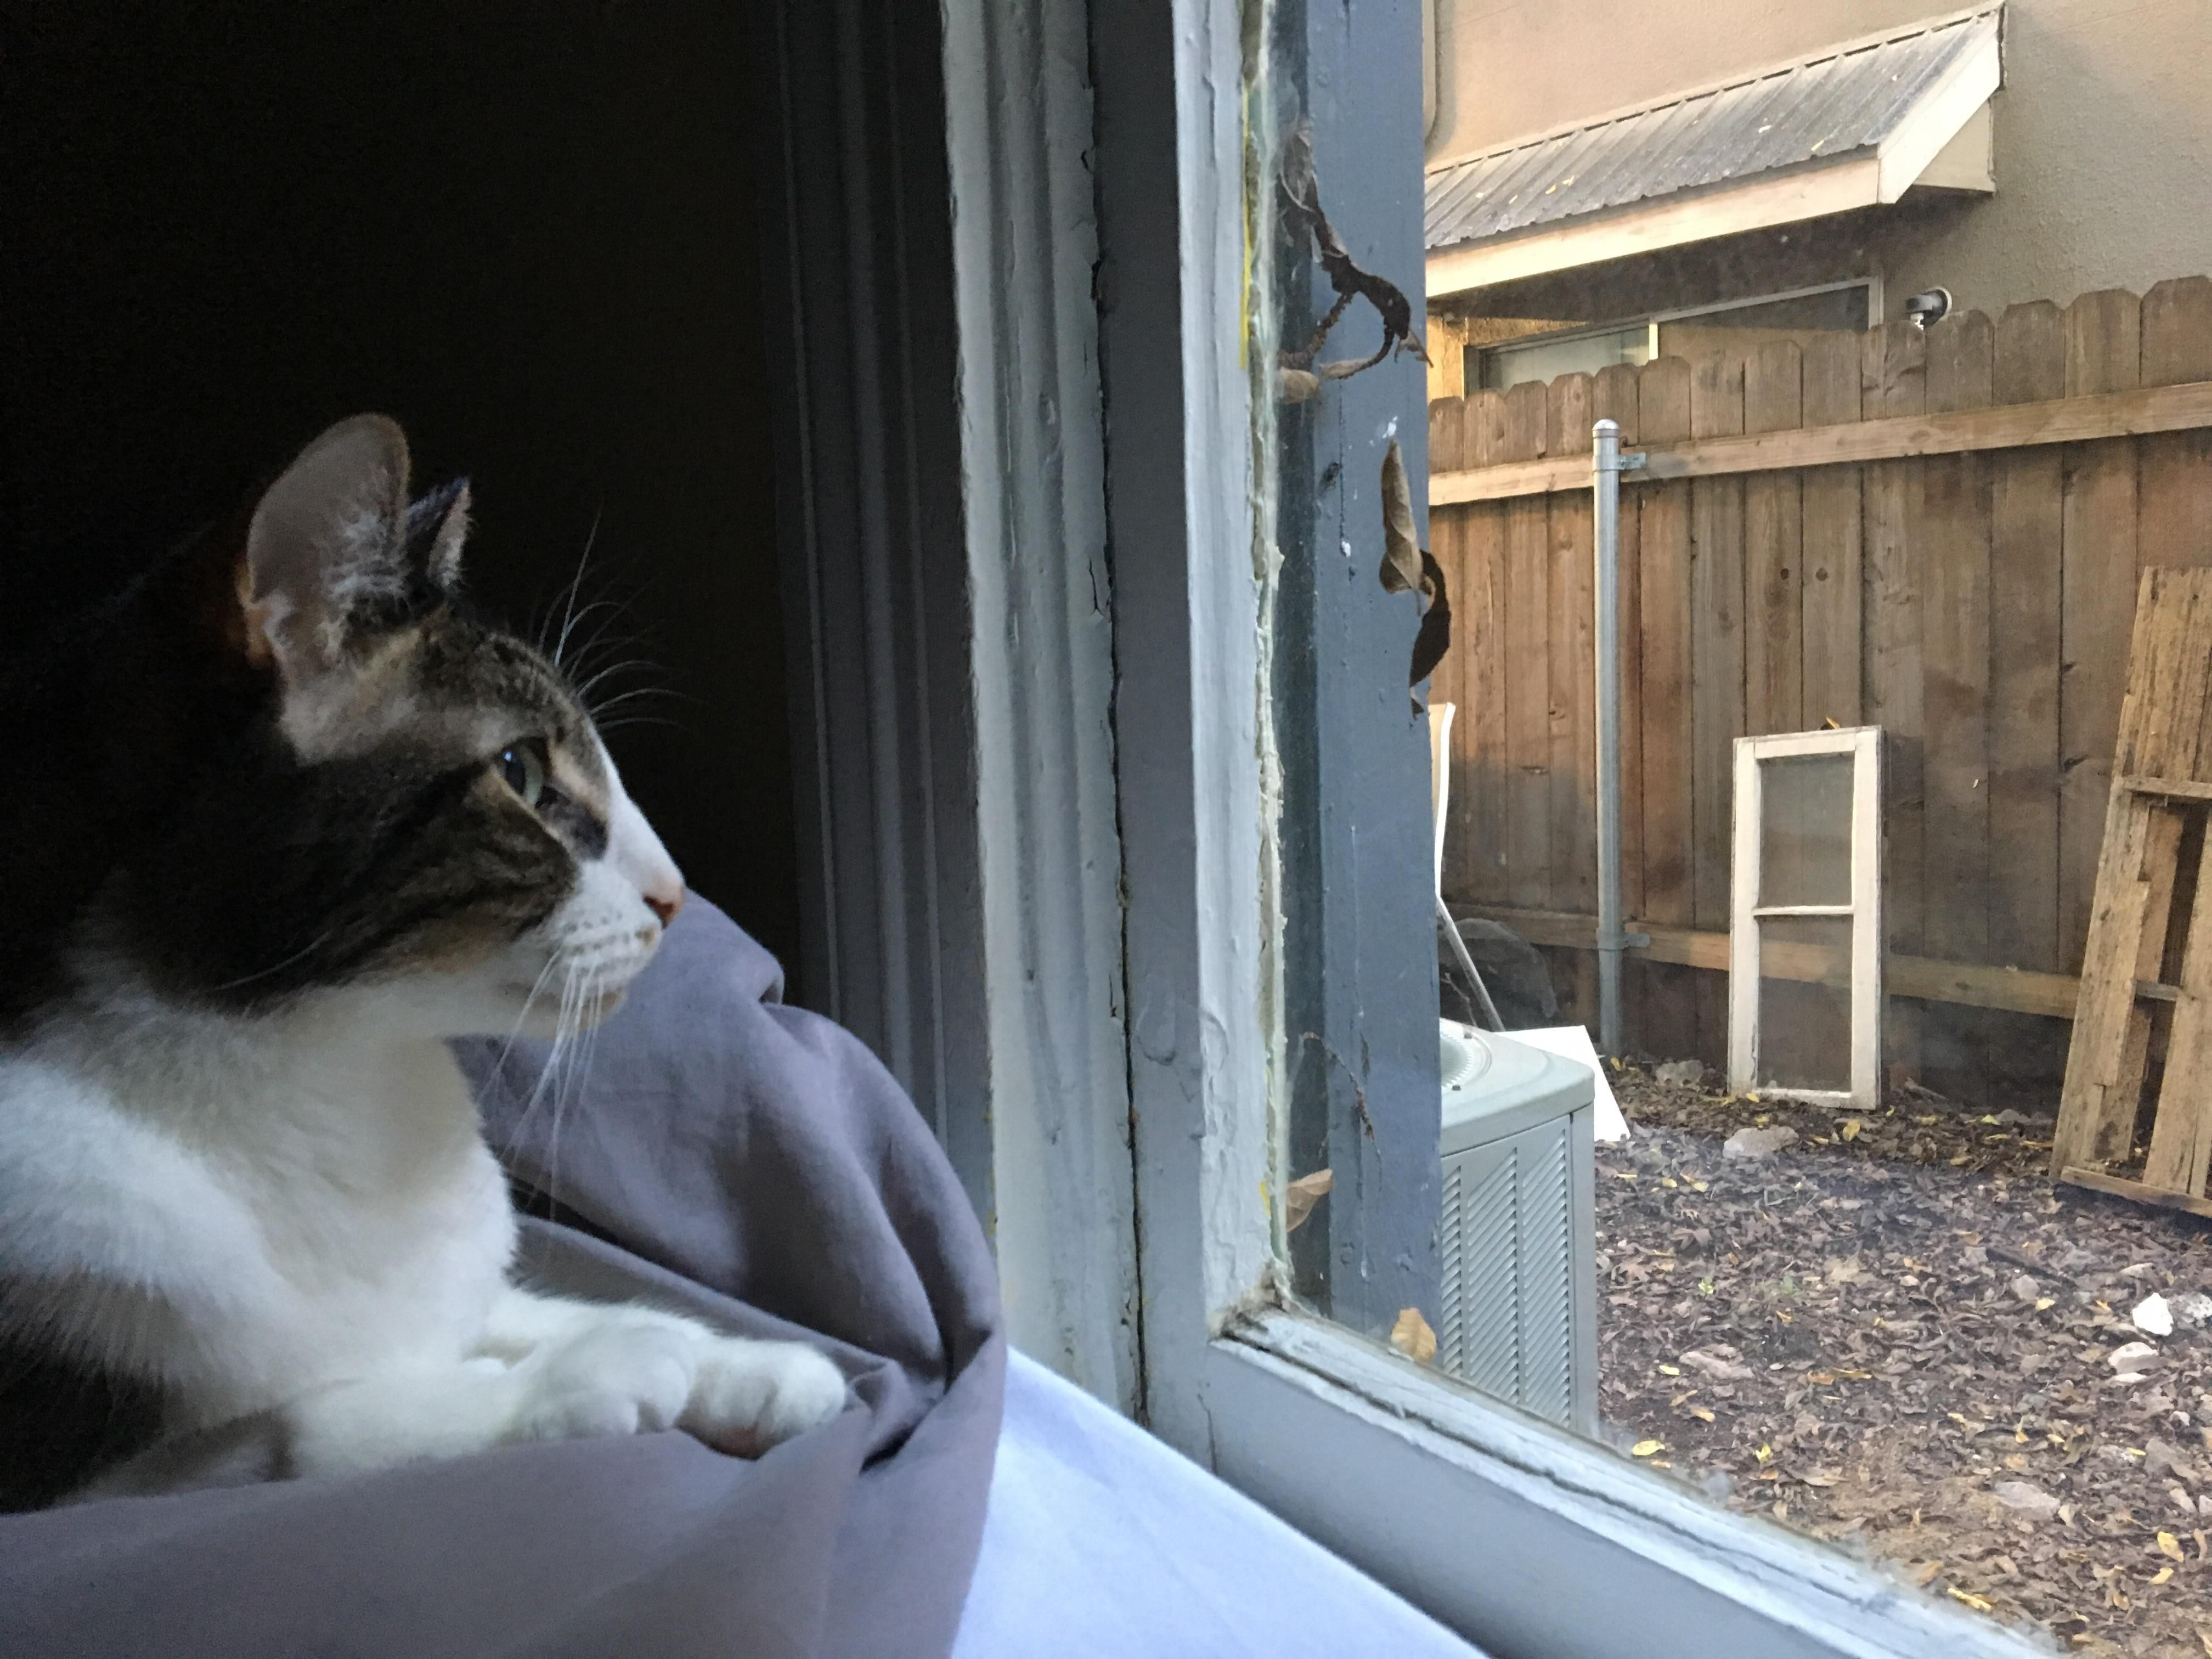 Good morning #aww #cute #cutecats #catsofpinterest #cuddle #fluffy #animals #pets #bestfriend #boopthesnoot